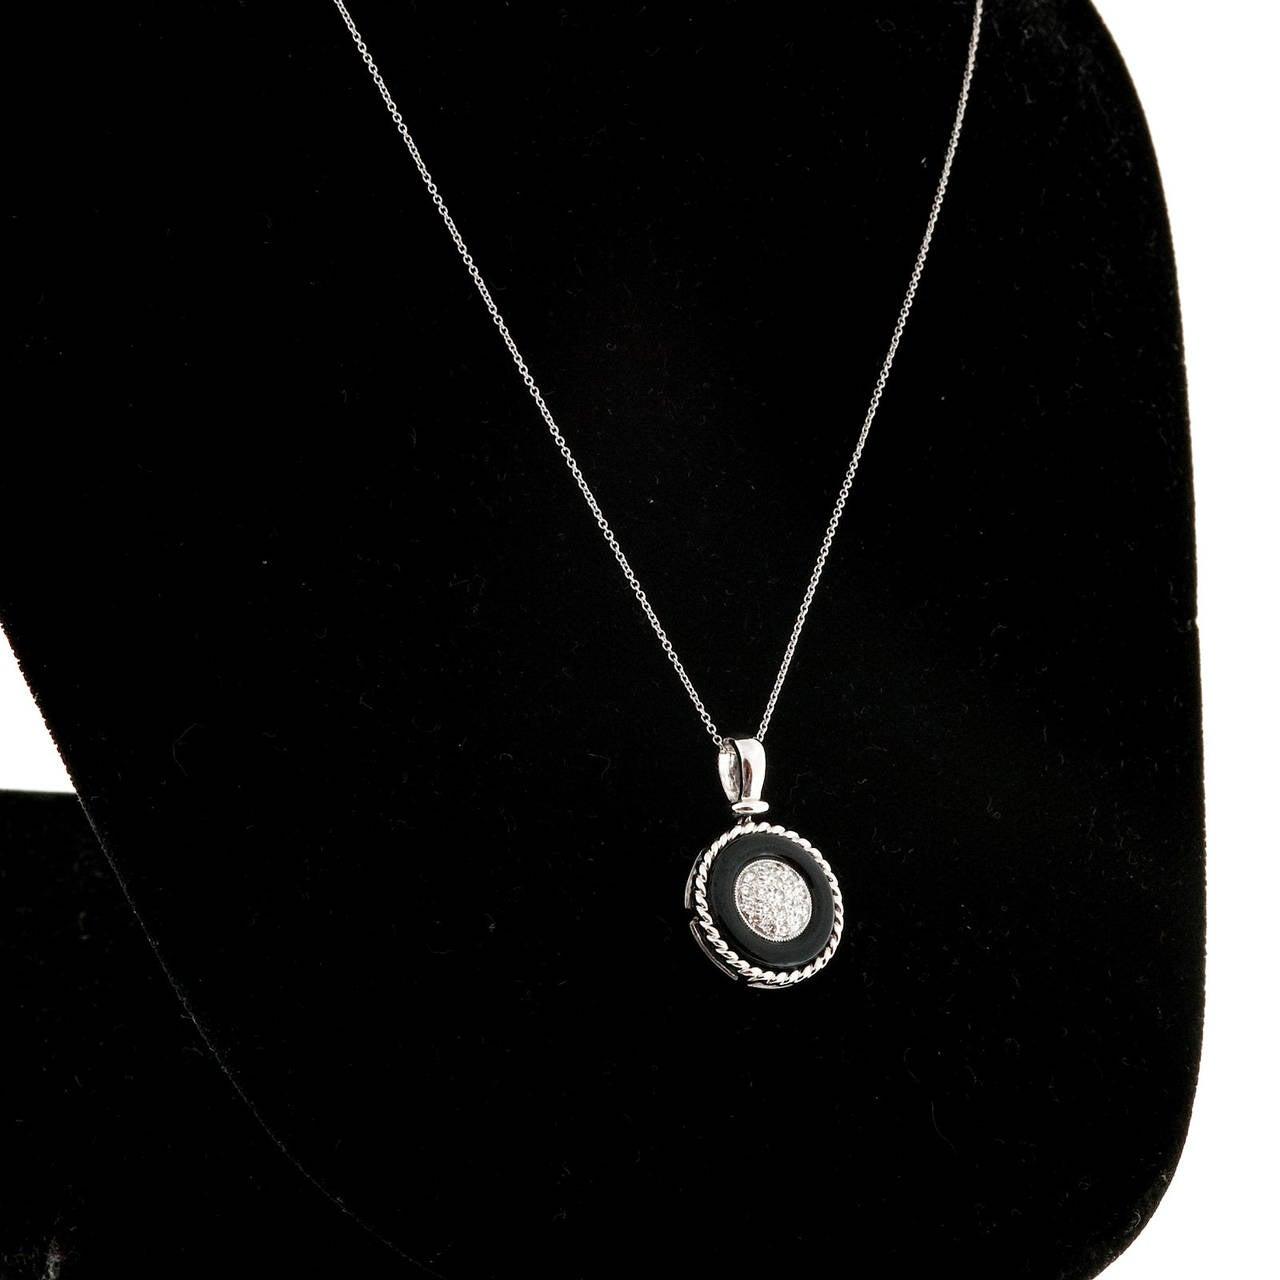 Black Onyx Circle Pave Diamond Platinum Necklace Pendant 6